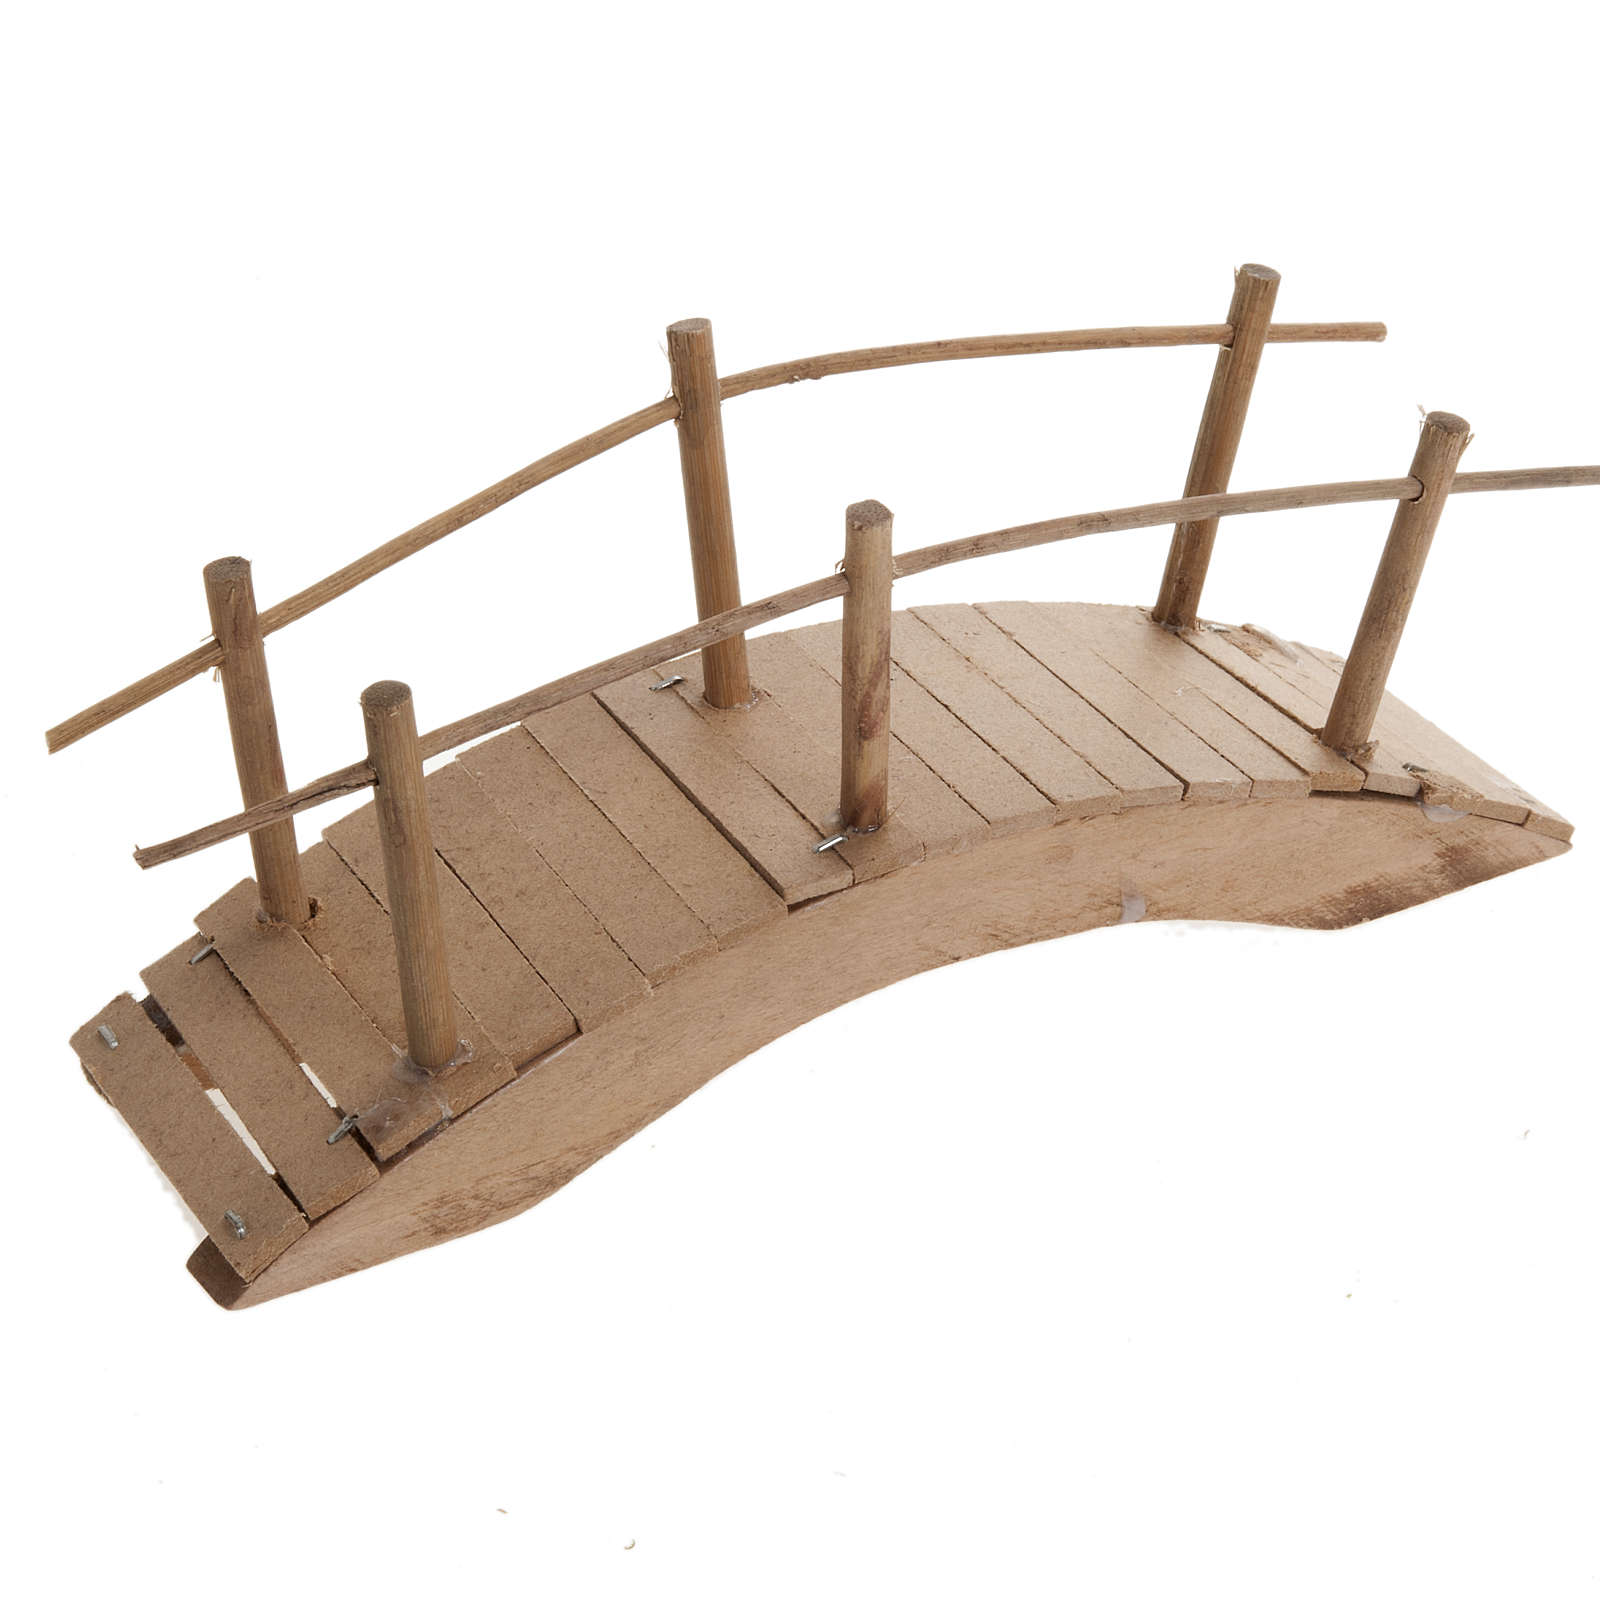 Nativity set accessory, wooden bridge with handrail 20x6 4